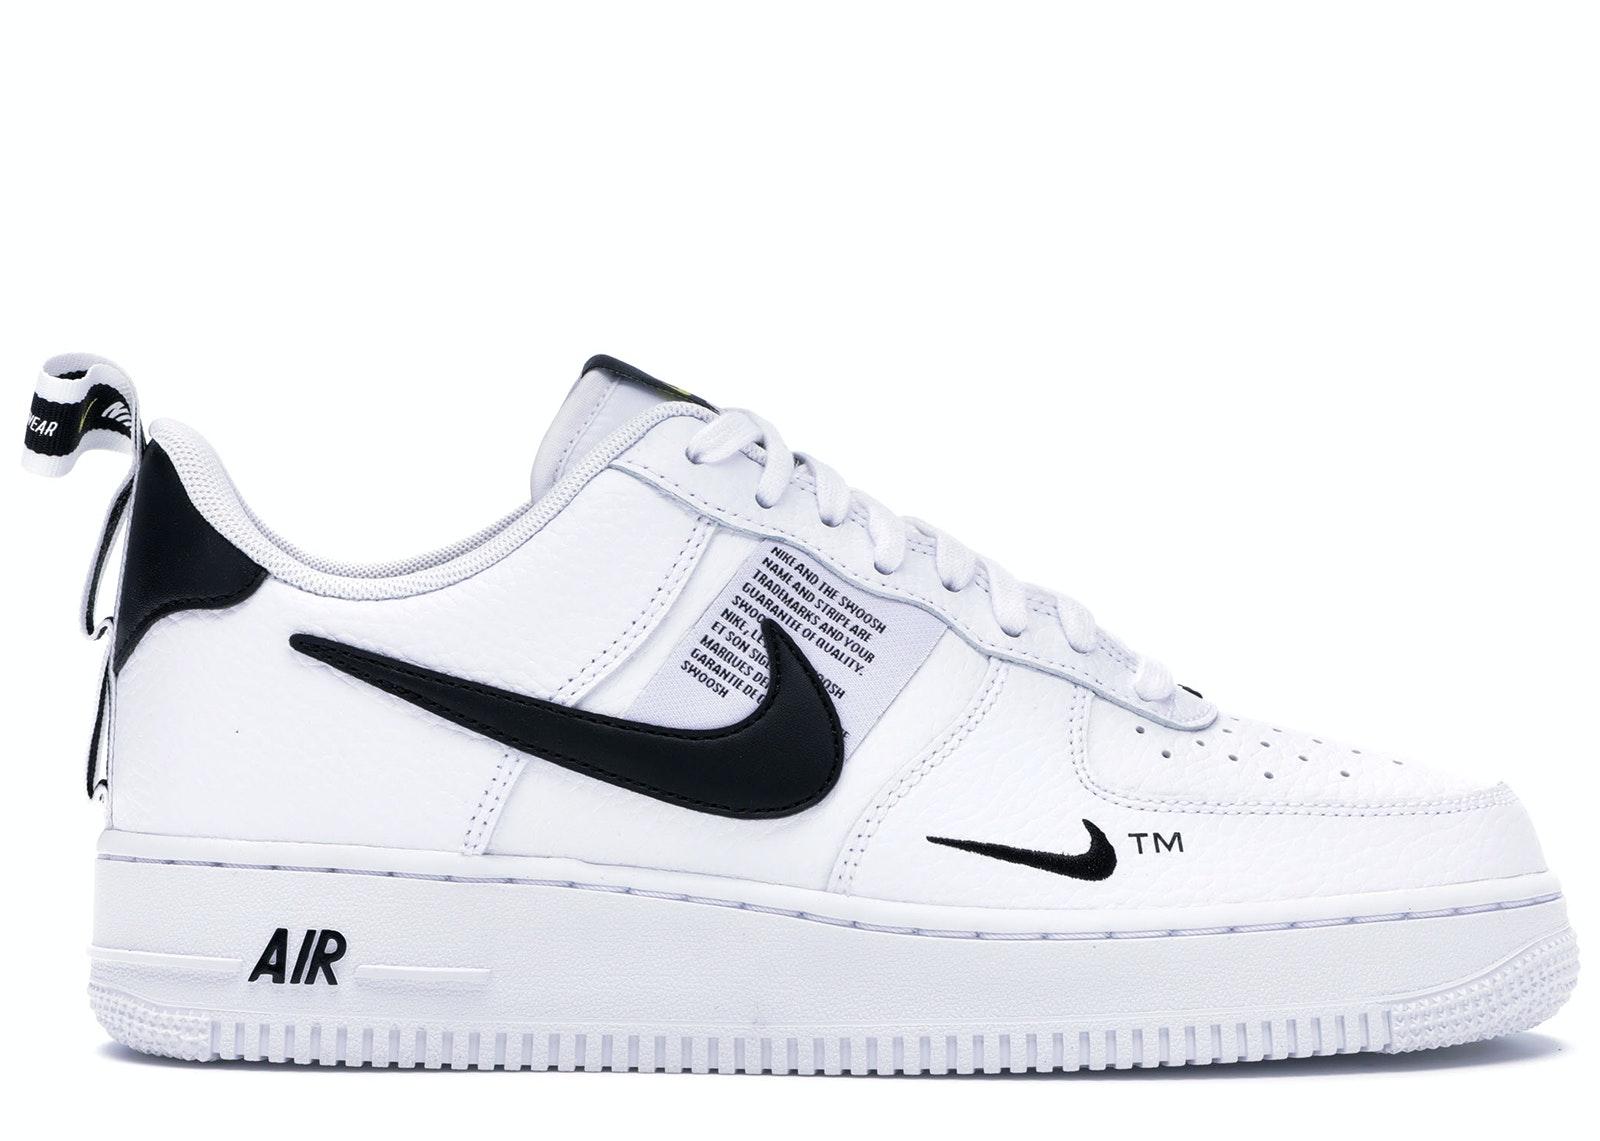 Air Force 1 Low Utility White Black - AJ7